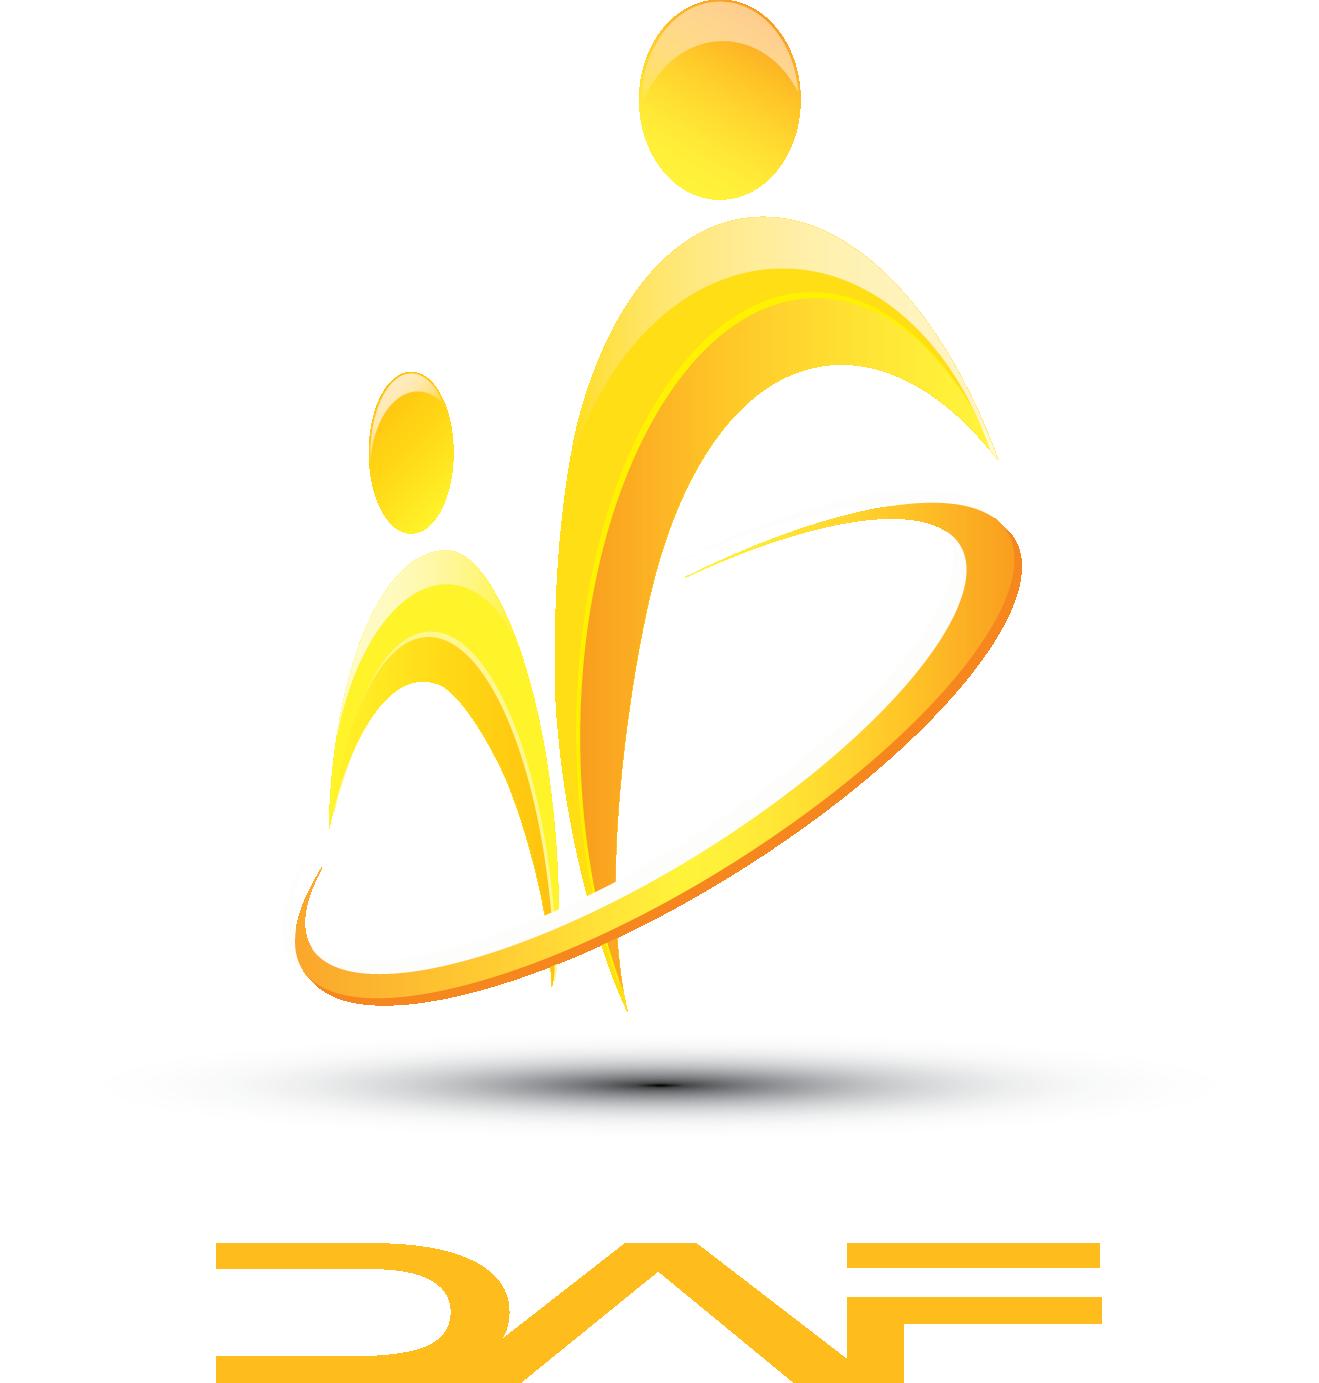 Digital Artwork Foundation Interntional Photographic Salon-2016 - logo